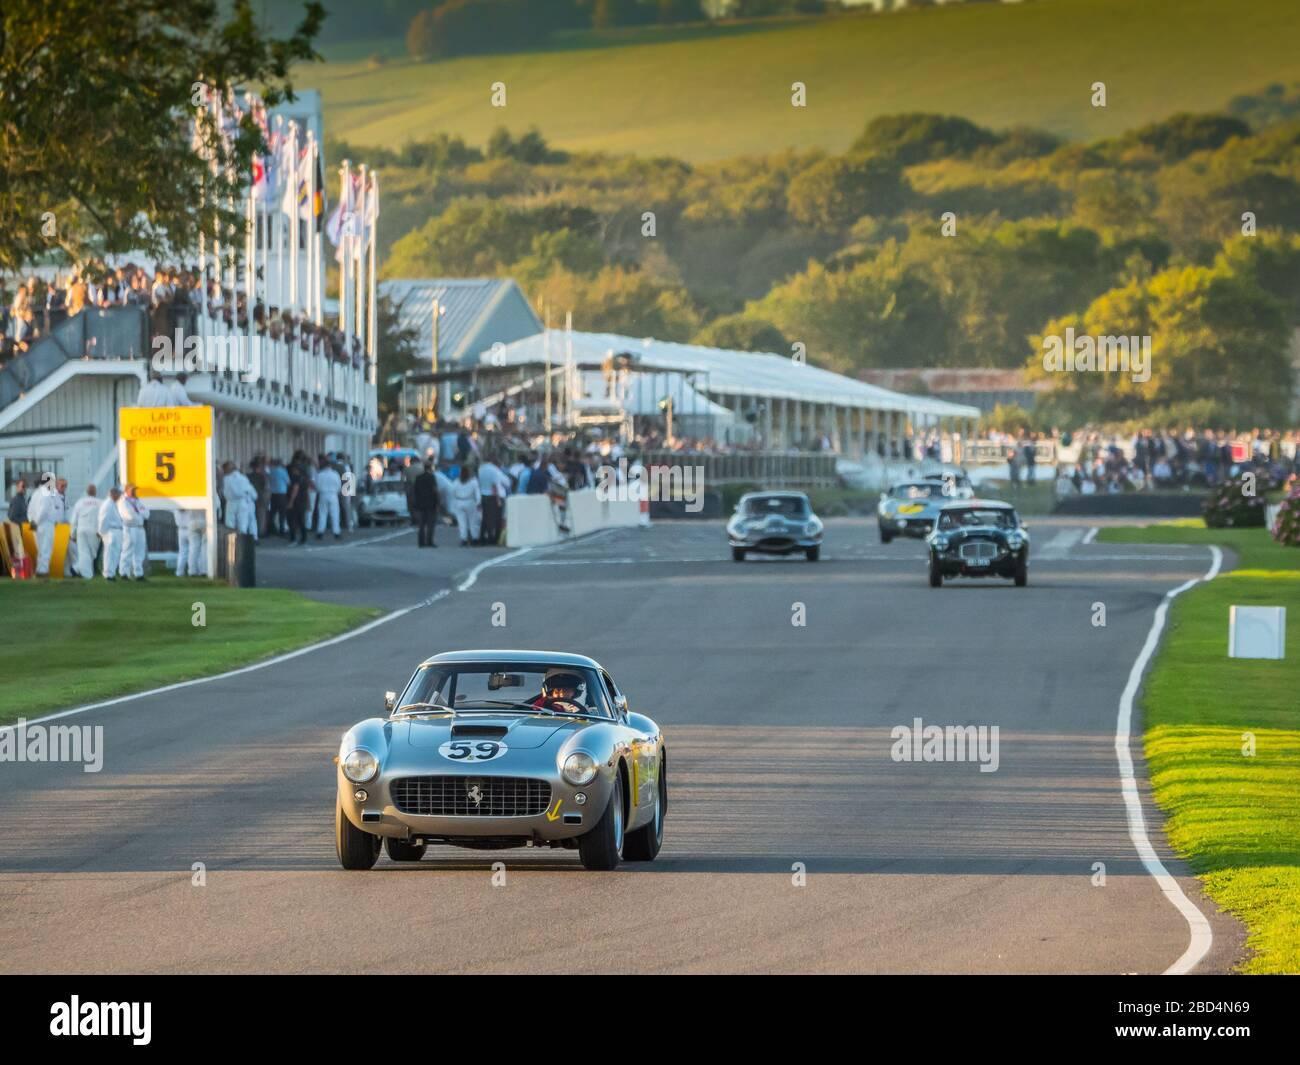 Ferrari 250 GT, Kinrara Trophy race , Goodwood Revival 2019 West Sussex UK Stock Photo